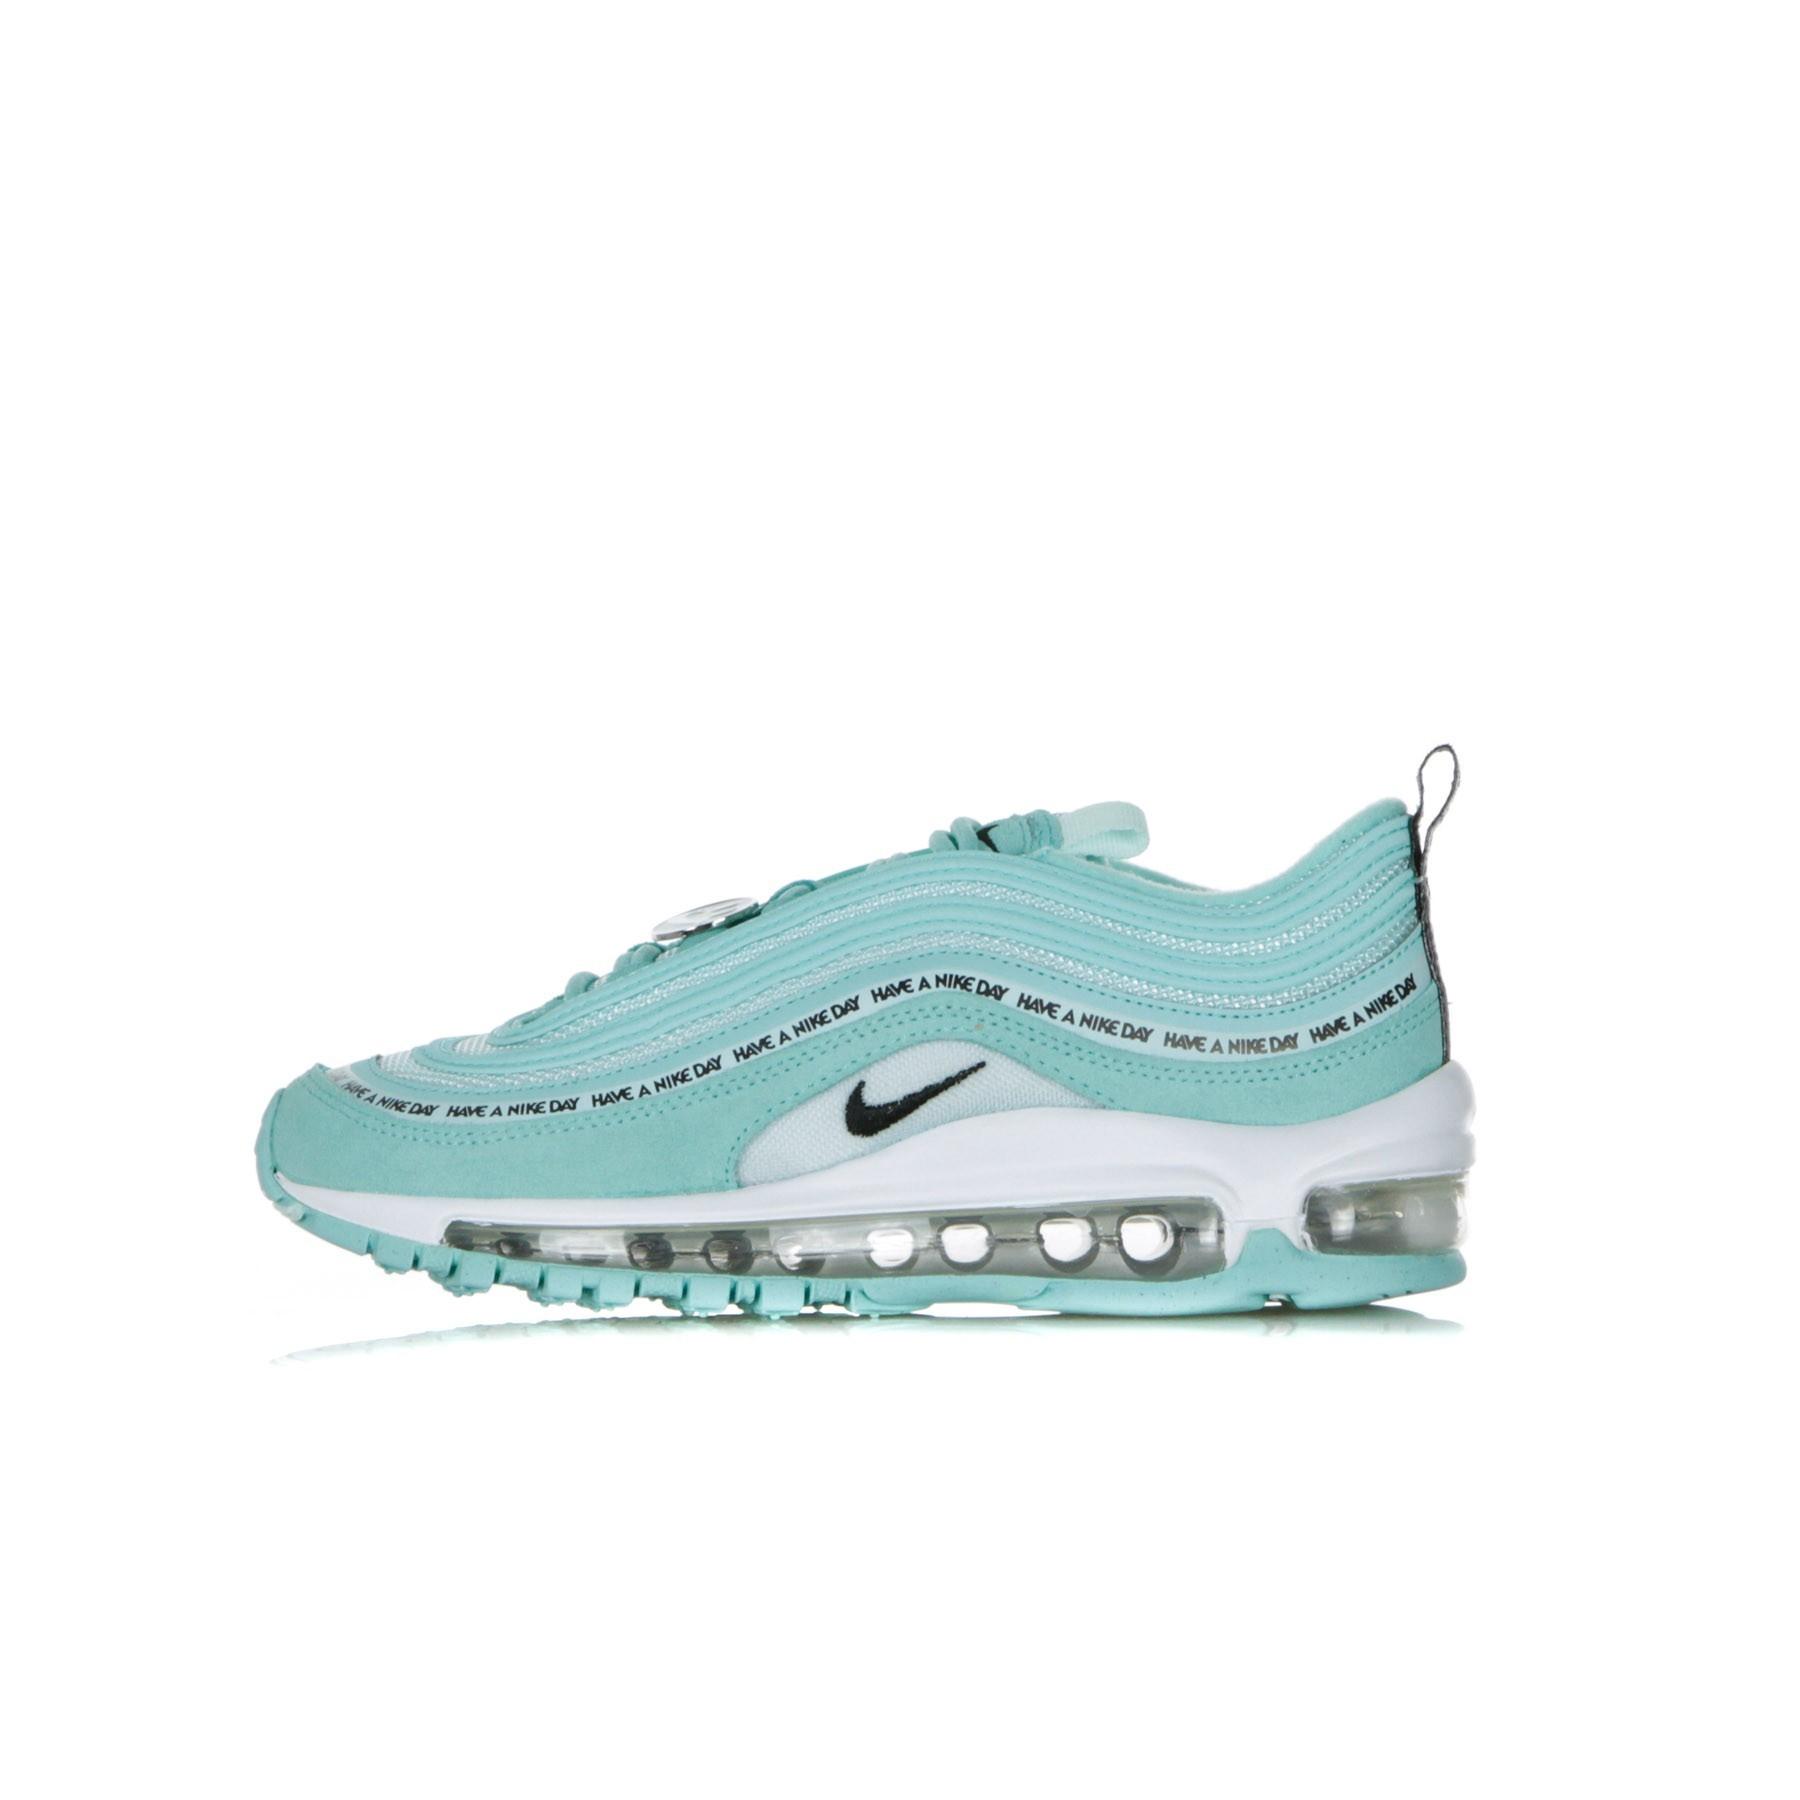 Max Tint Scarpa Nike Air 97 Gs Twistblackteal Bassa Tropical Se bD9YEHWe2I